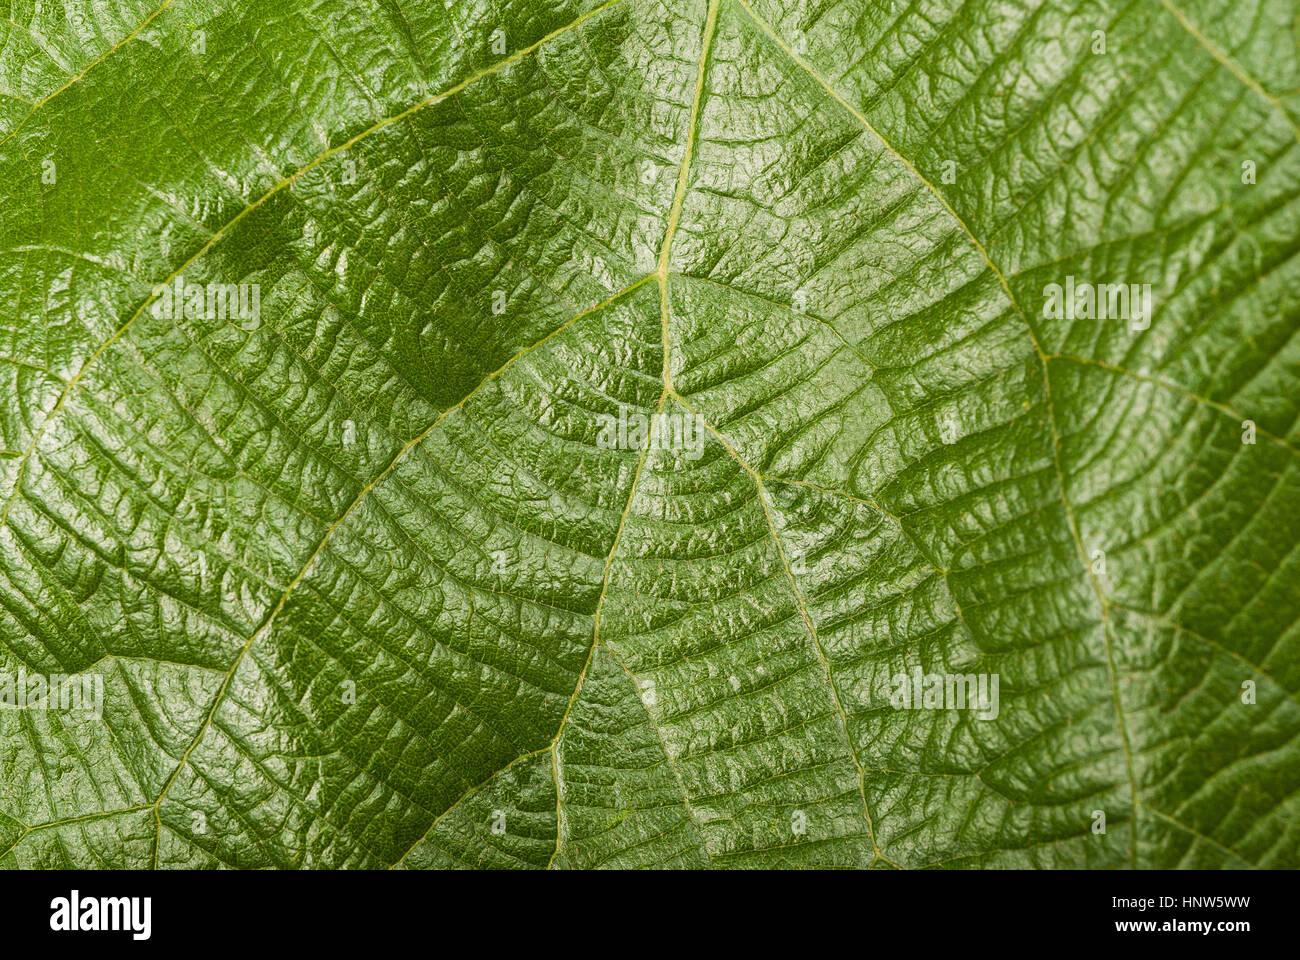 Grünen Hintergrund der Kiwi-Blatt Stockbild